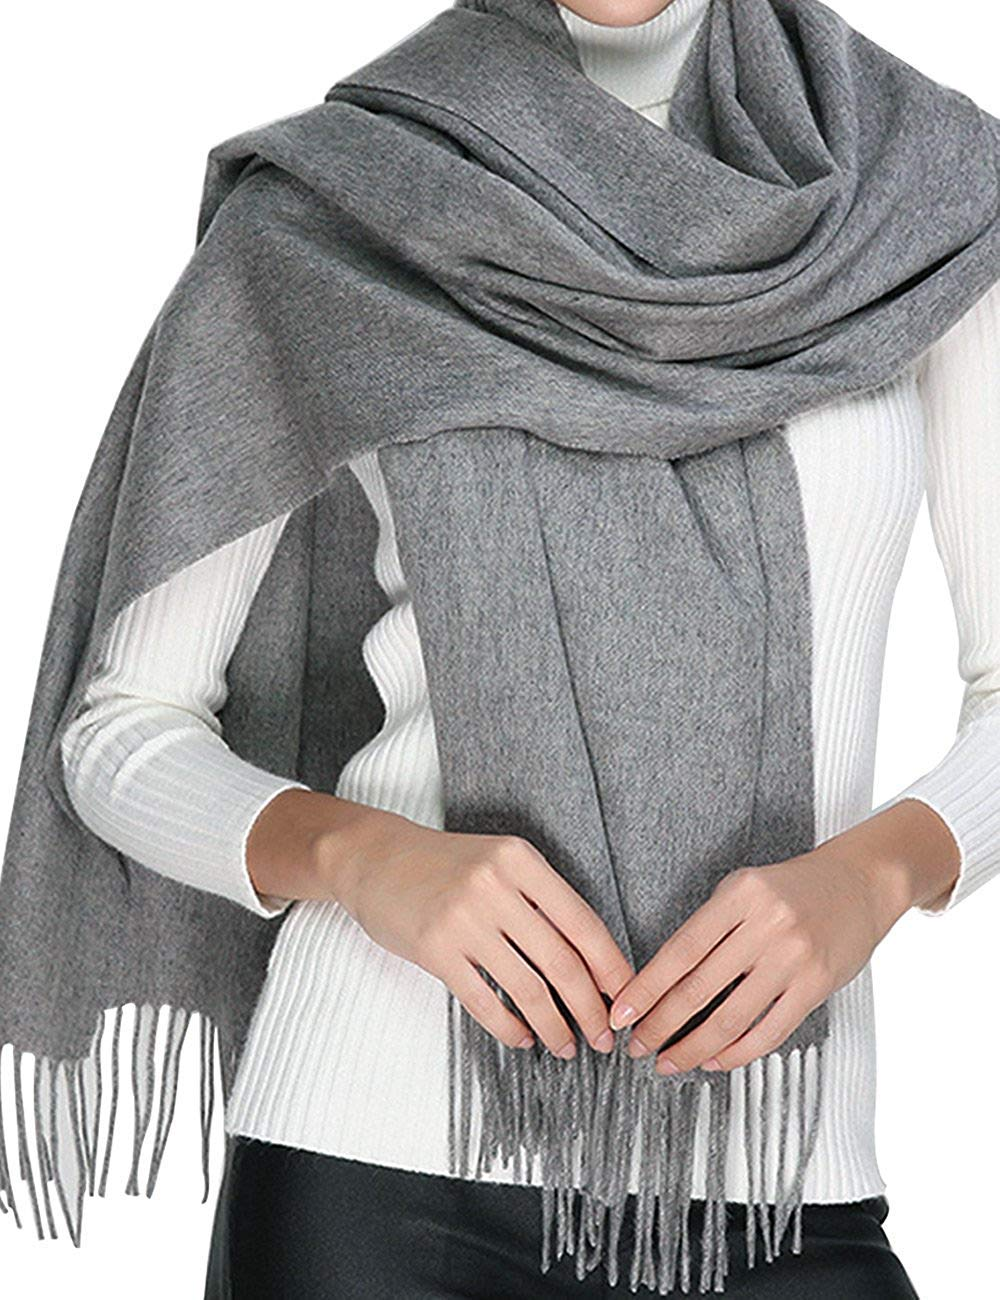 Cashmere Wool Scarf, Large Soft Women Men Scarves Winter Warm Shawl Gift lightsalt